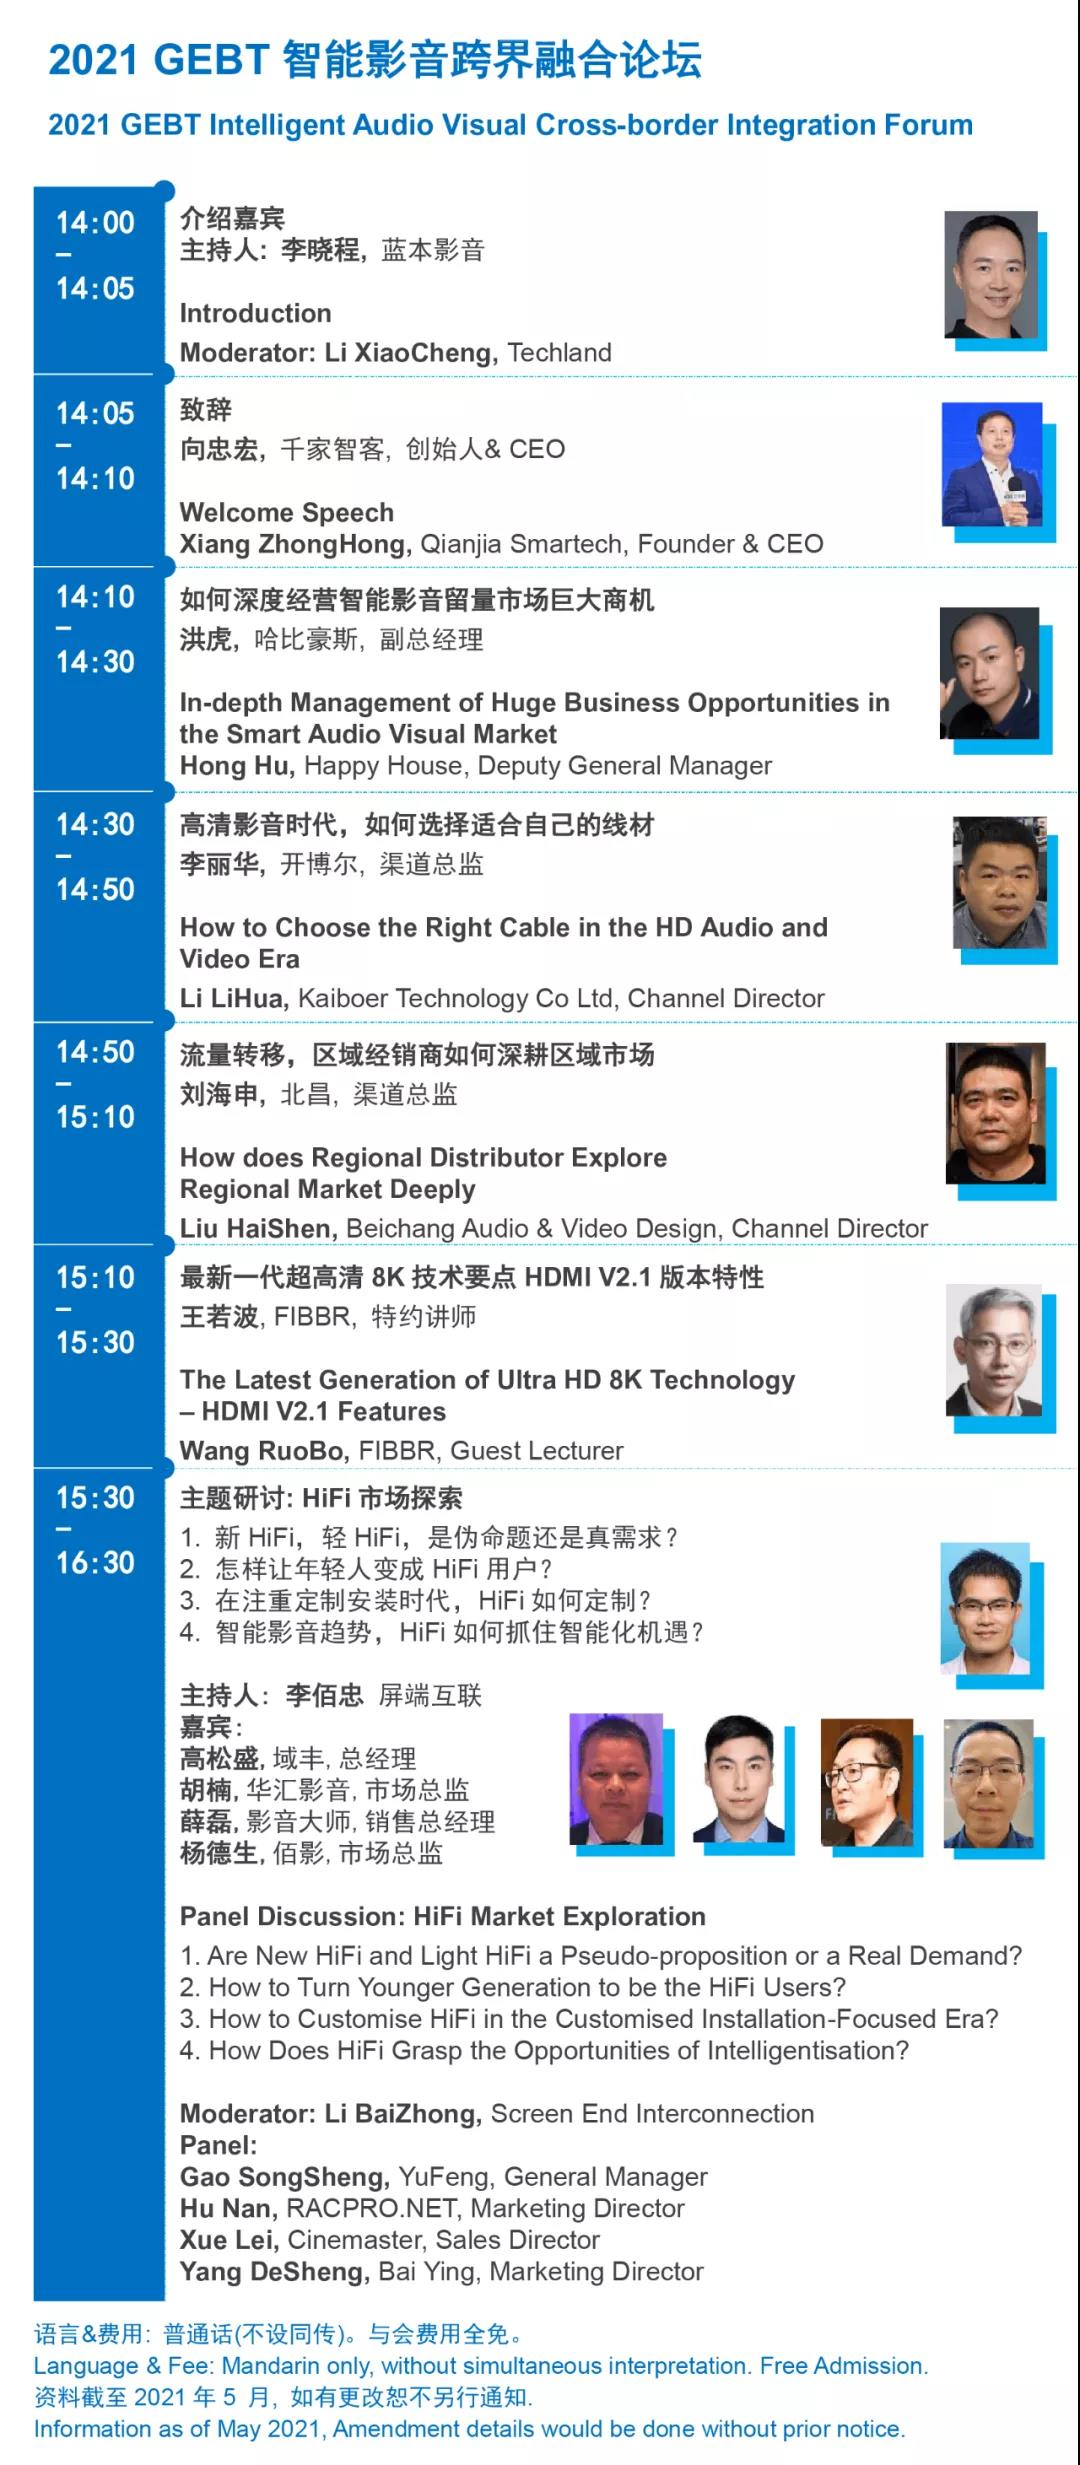 GEBT论坛活动丨2021 GEBT智能影音跨界融合论坛